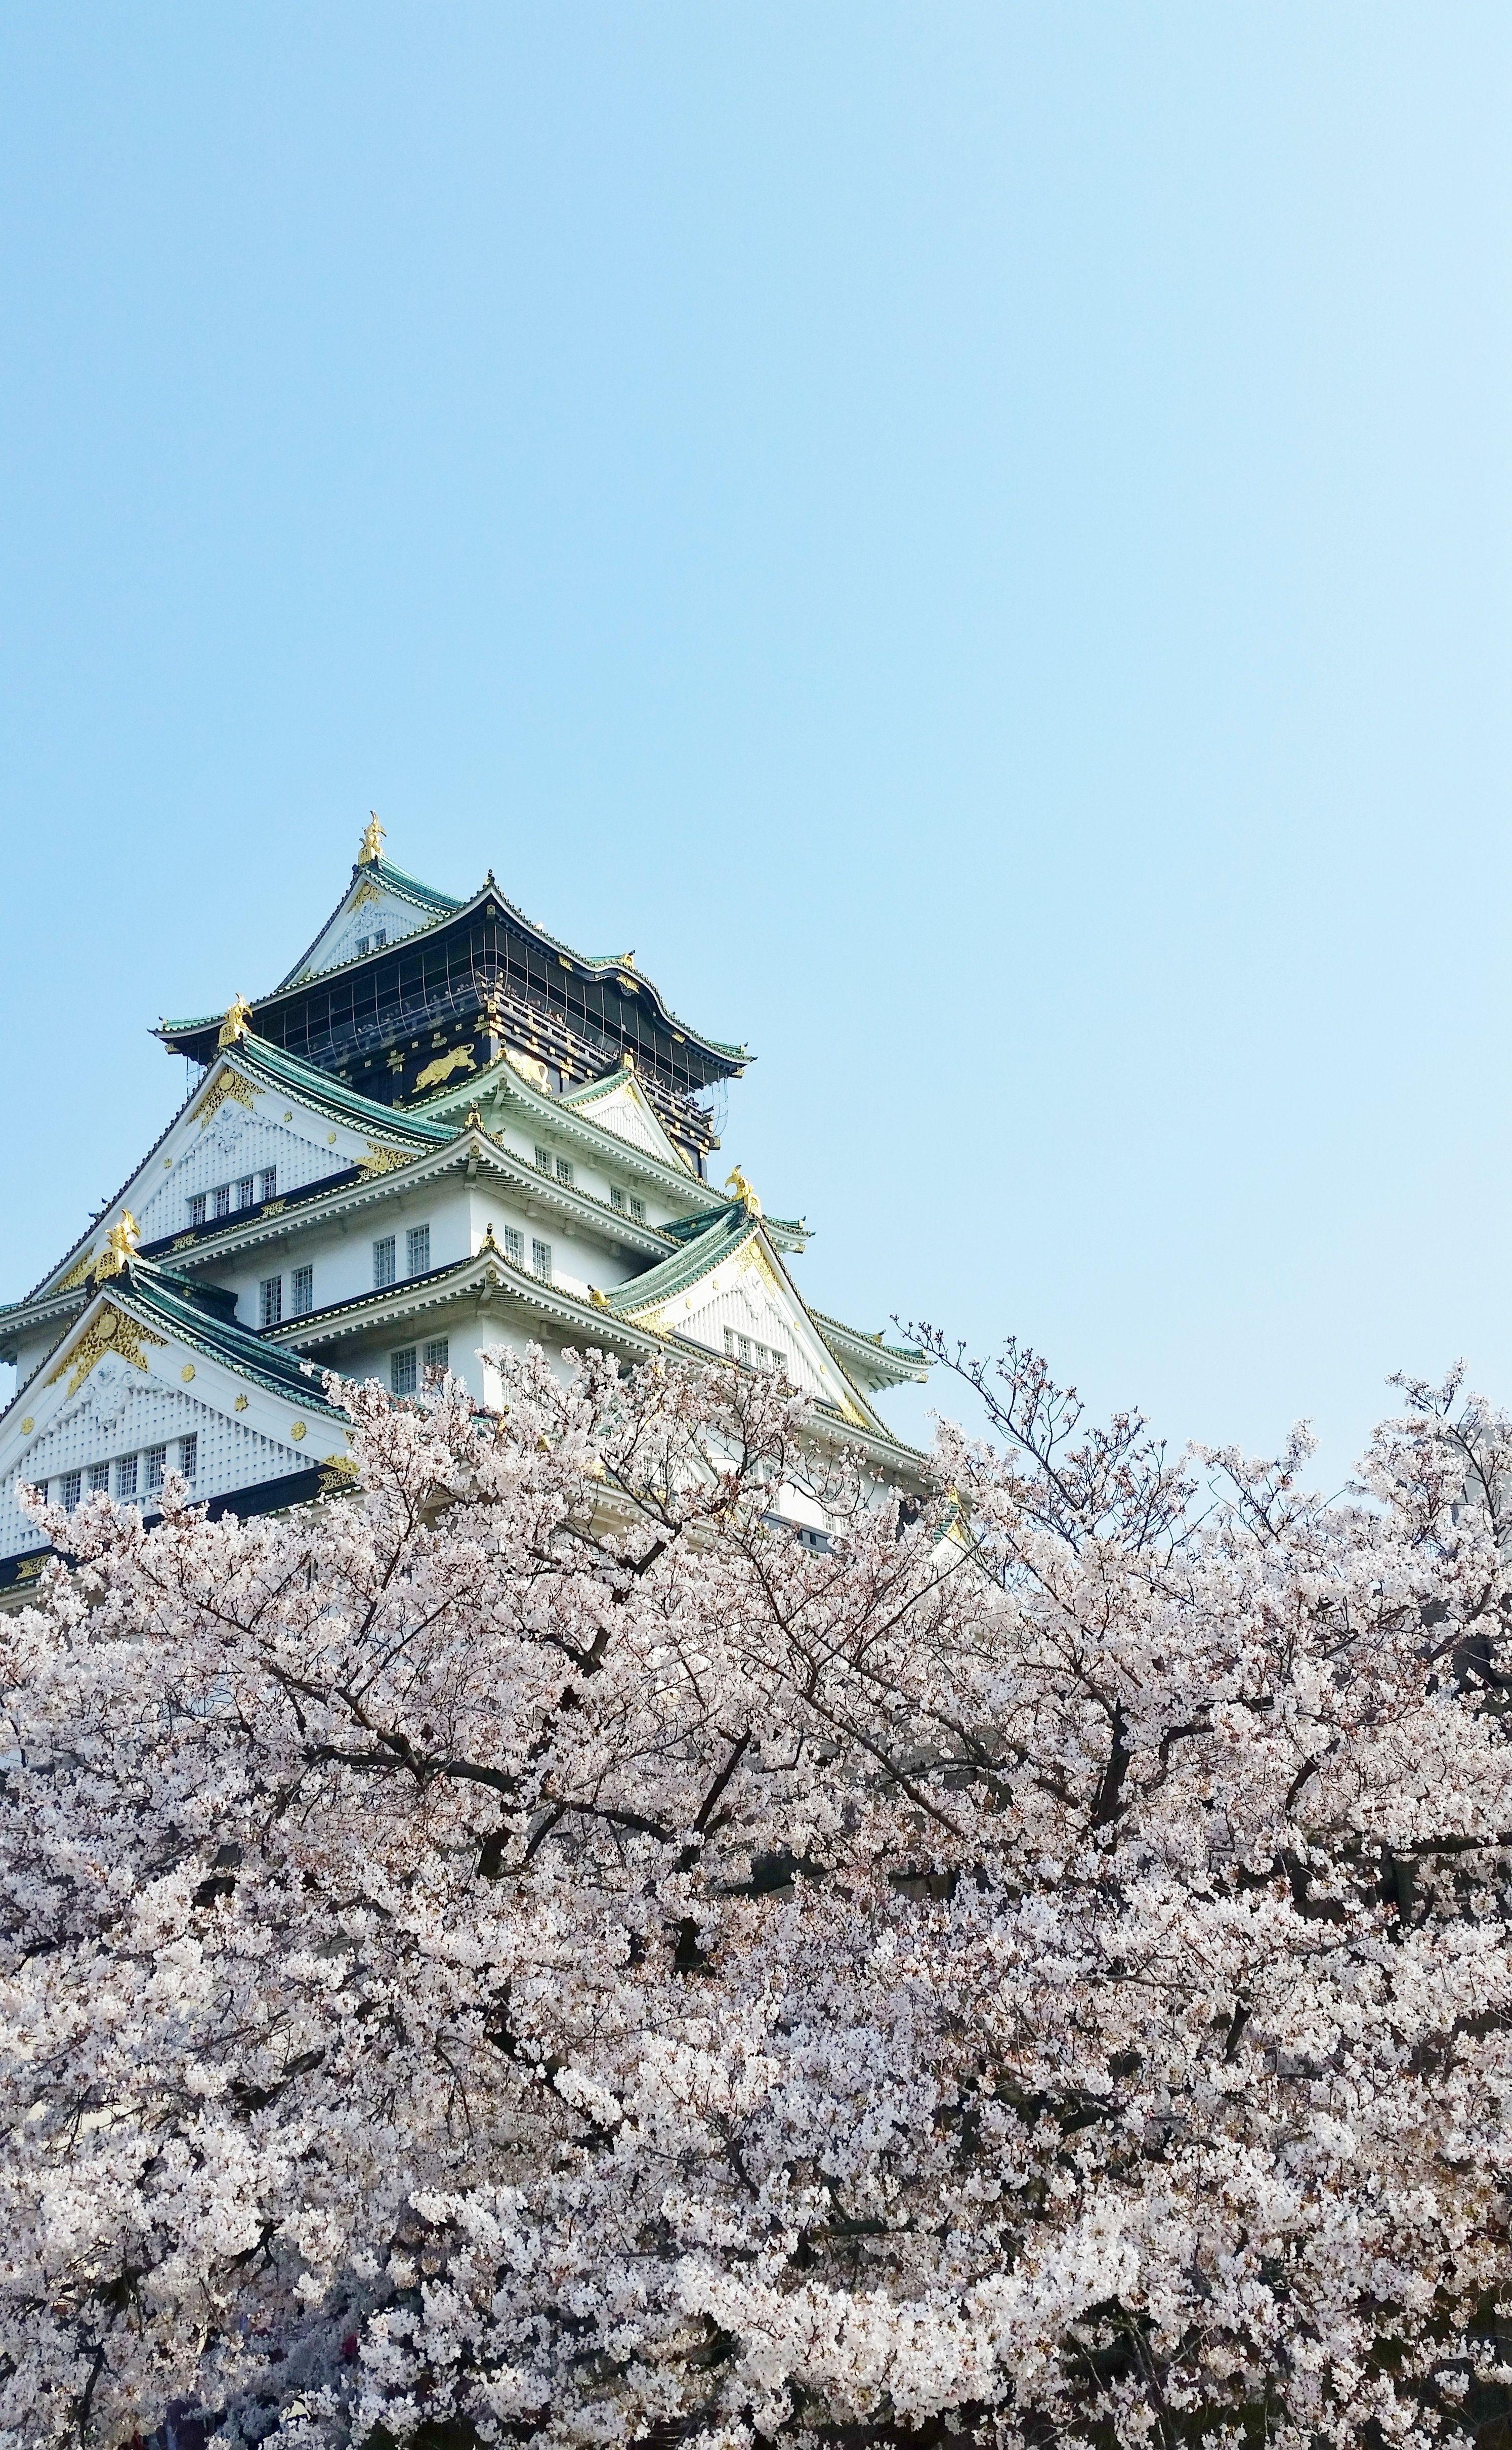 Perfect Osaka Castle Cherry Blossom Photo Spots Backpacking Japan Spring Travel Flashpacking Japan Japan Travel Photography Japan Travel Destinations Japan Itinerary